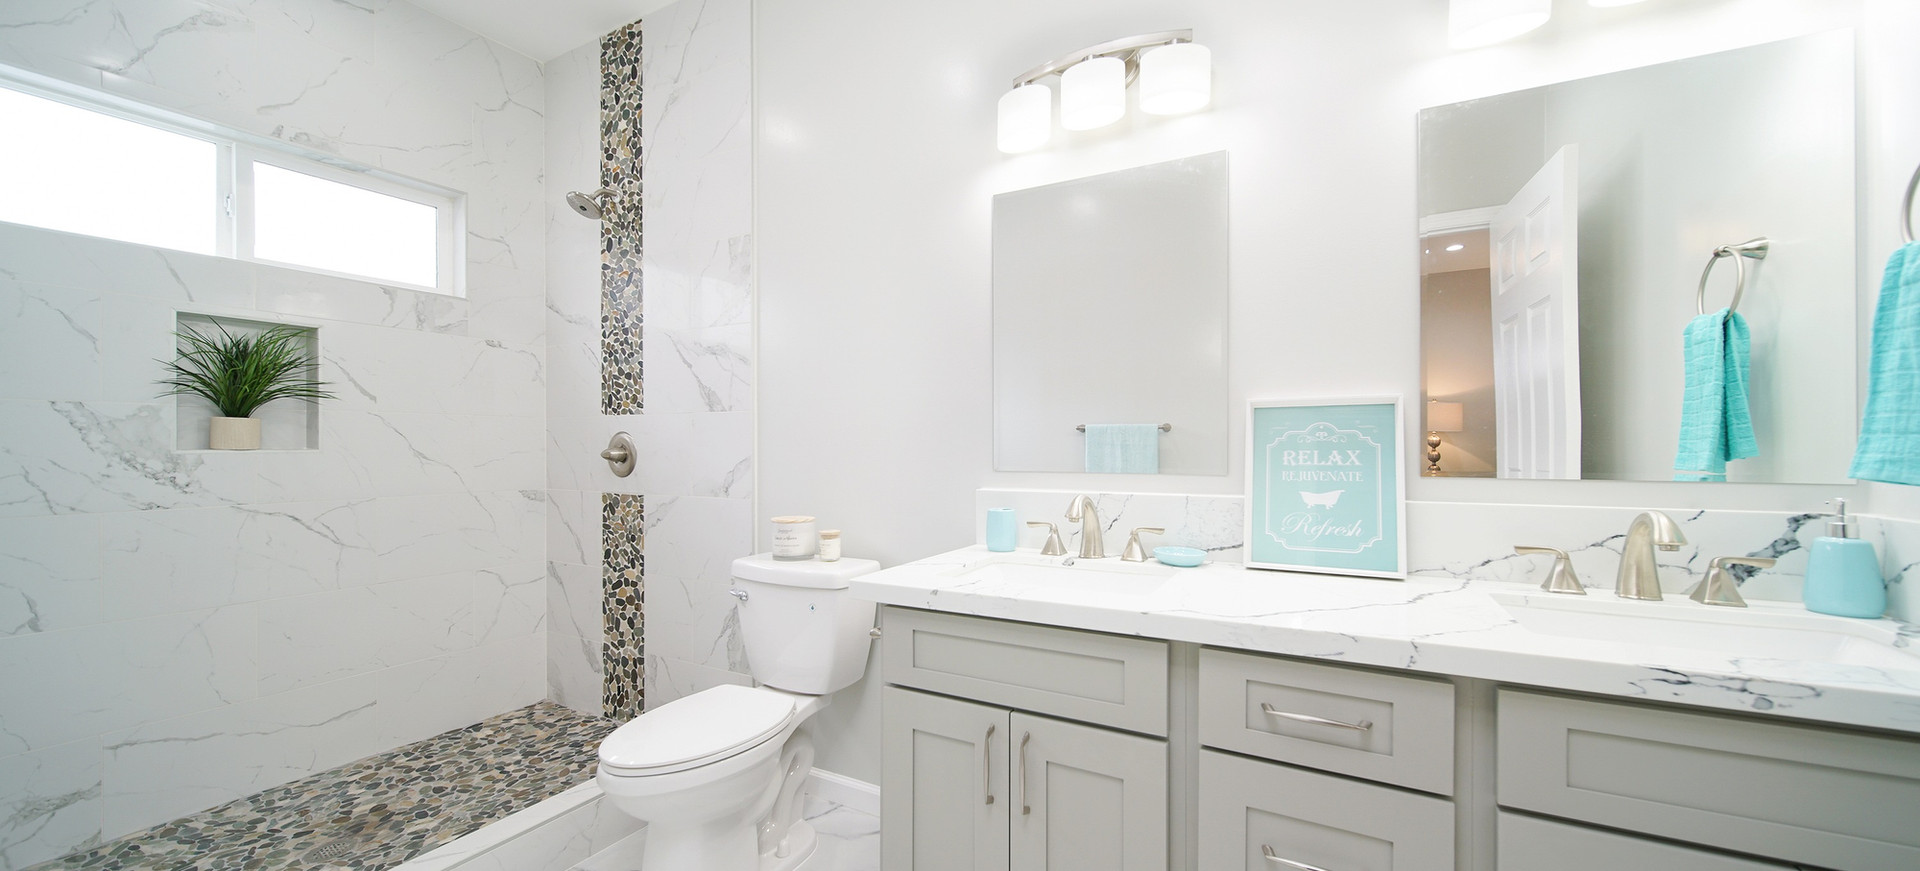 Master Bathroom of Hao Street Residence